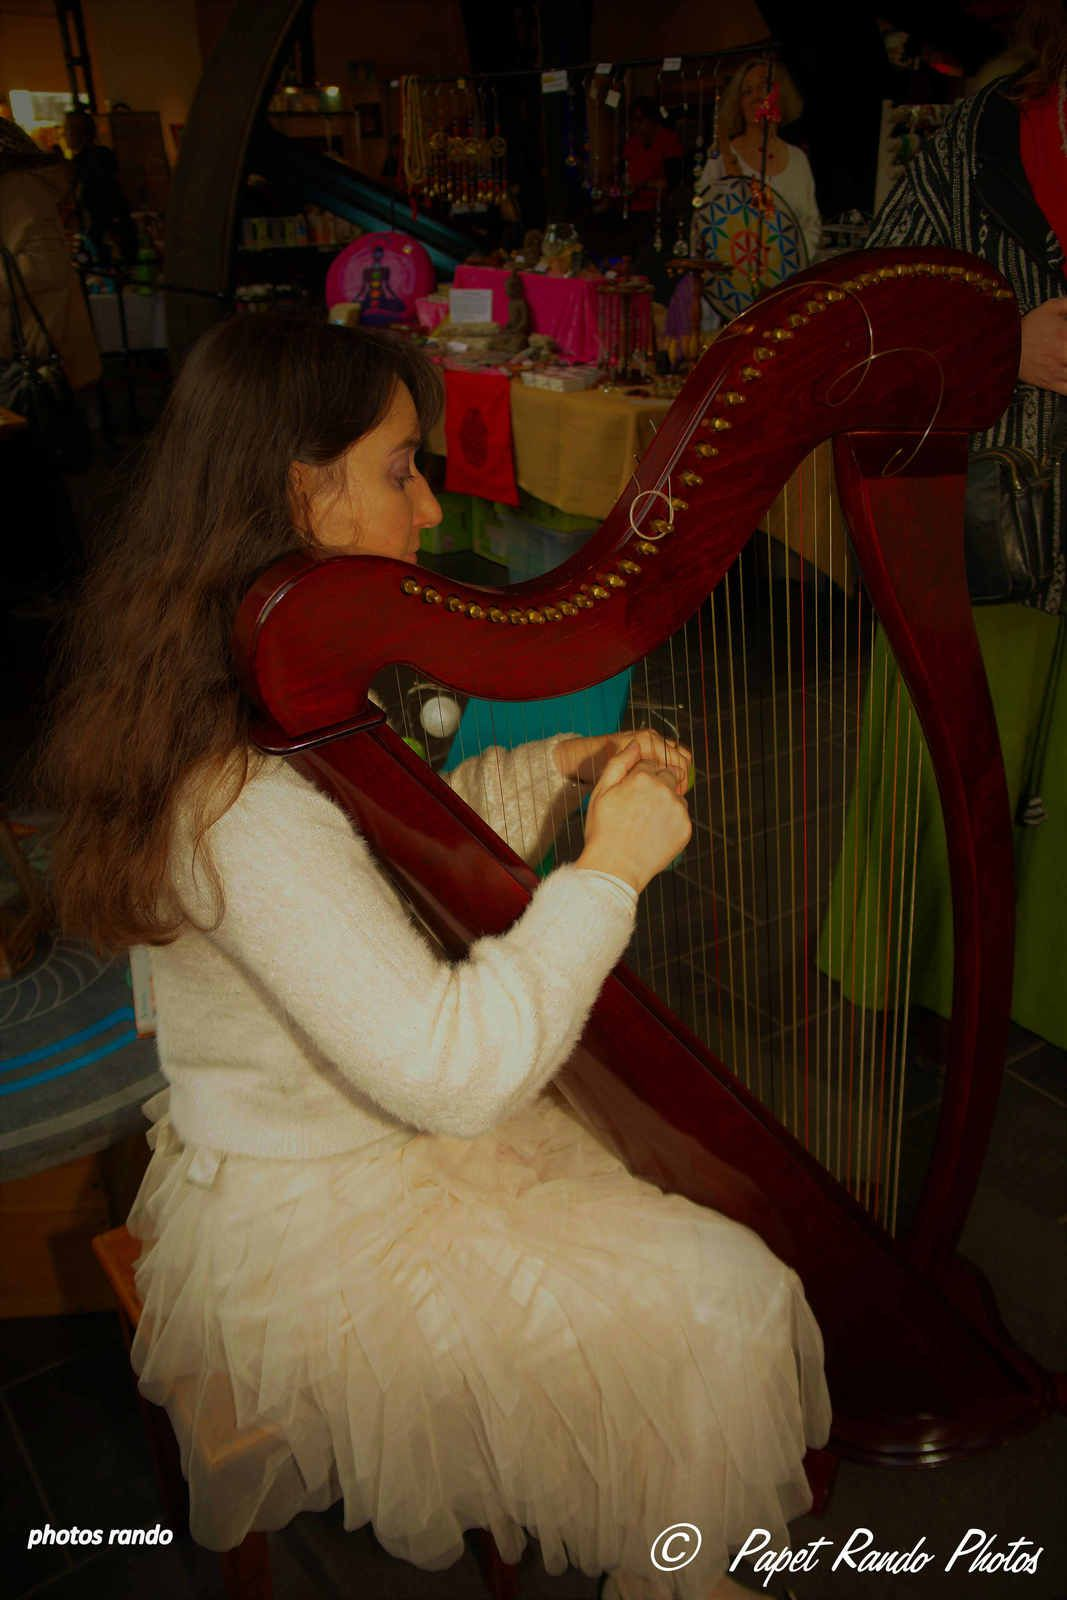 Anima Keltia Musica celtica, medievale,rinoscimentale e fantasy ( de Verone ) au medievale de Monceau, Corroy Le Chateau, a Verone     , Verone etc